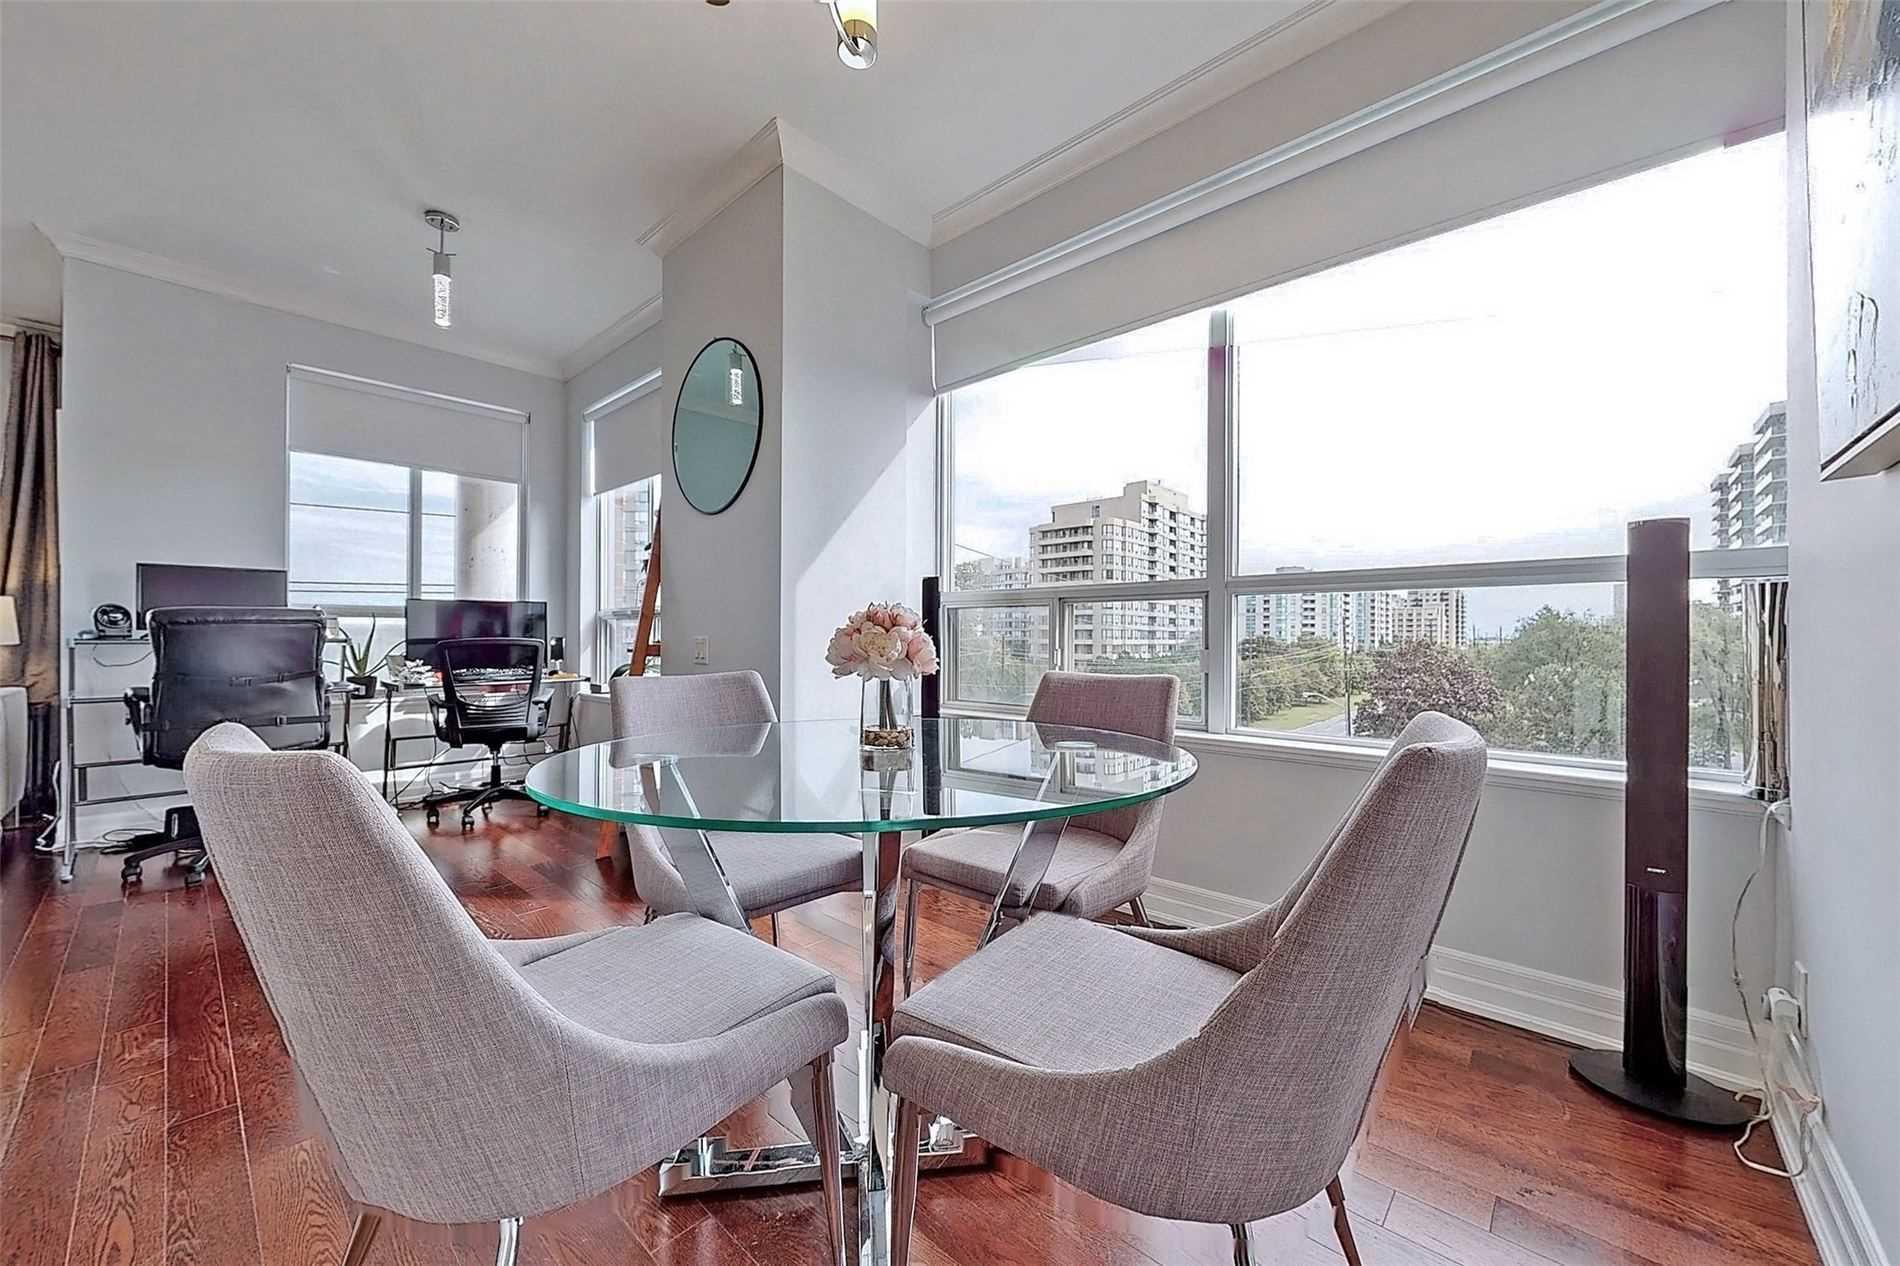 Condo Apt For Sale In Toronto , 2 Bedrooms Bedrooms, ,2 BathroomsBathrooms,Condo Apt,For Sale,508,Steeles